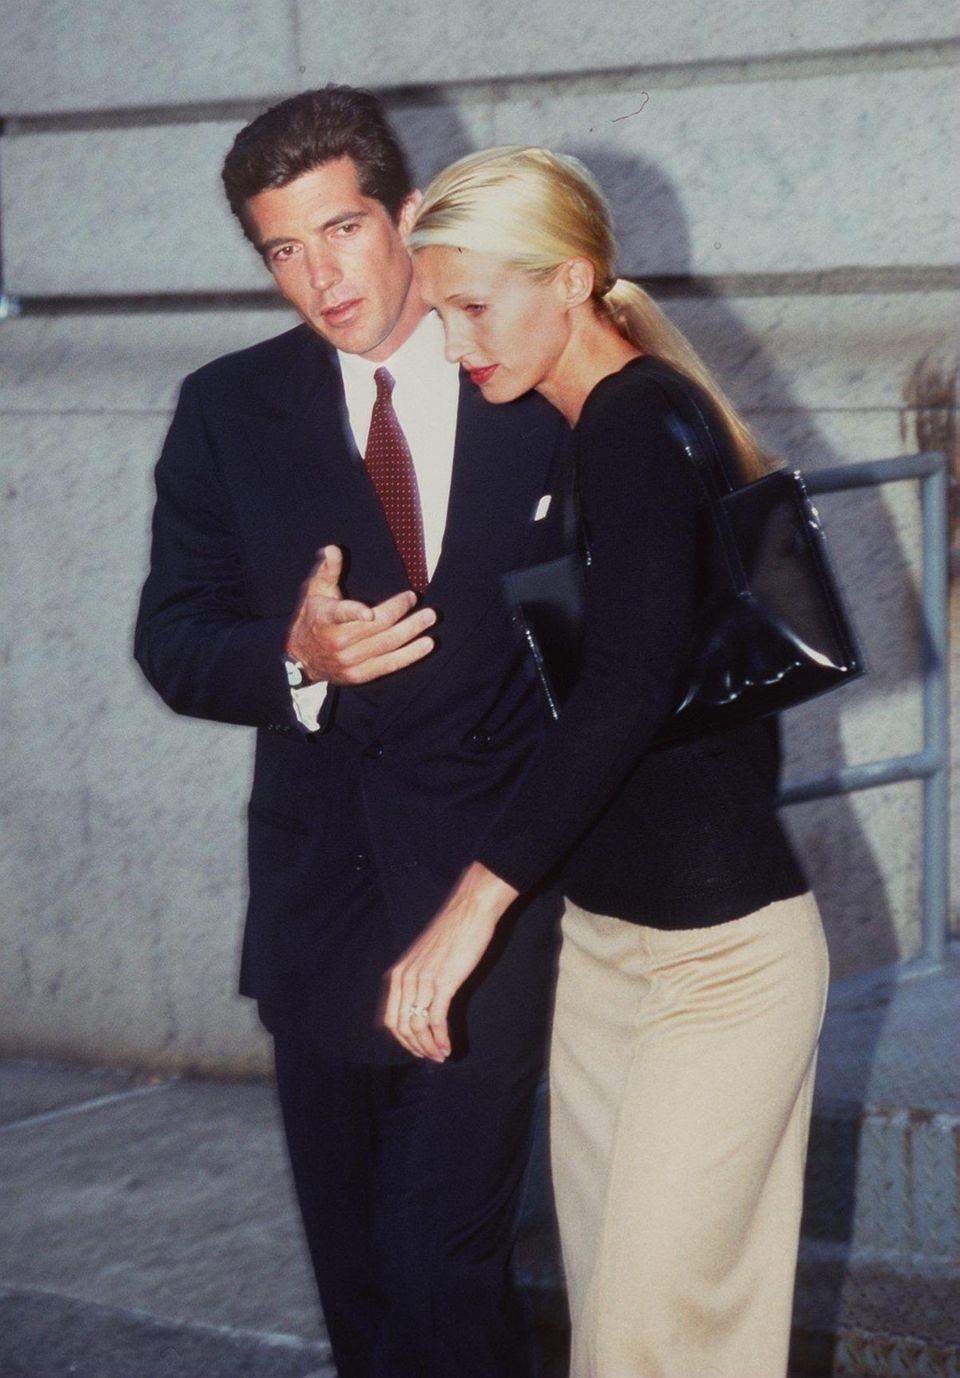 John Kennedy Jr. and his new wife, Carolyn